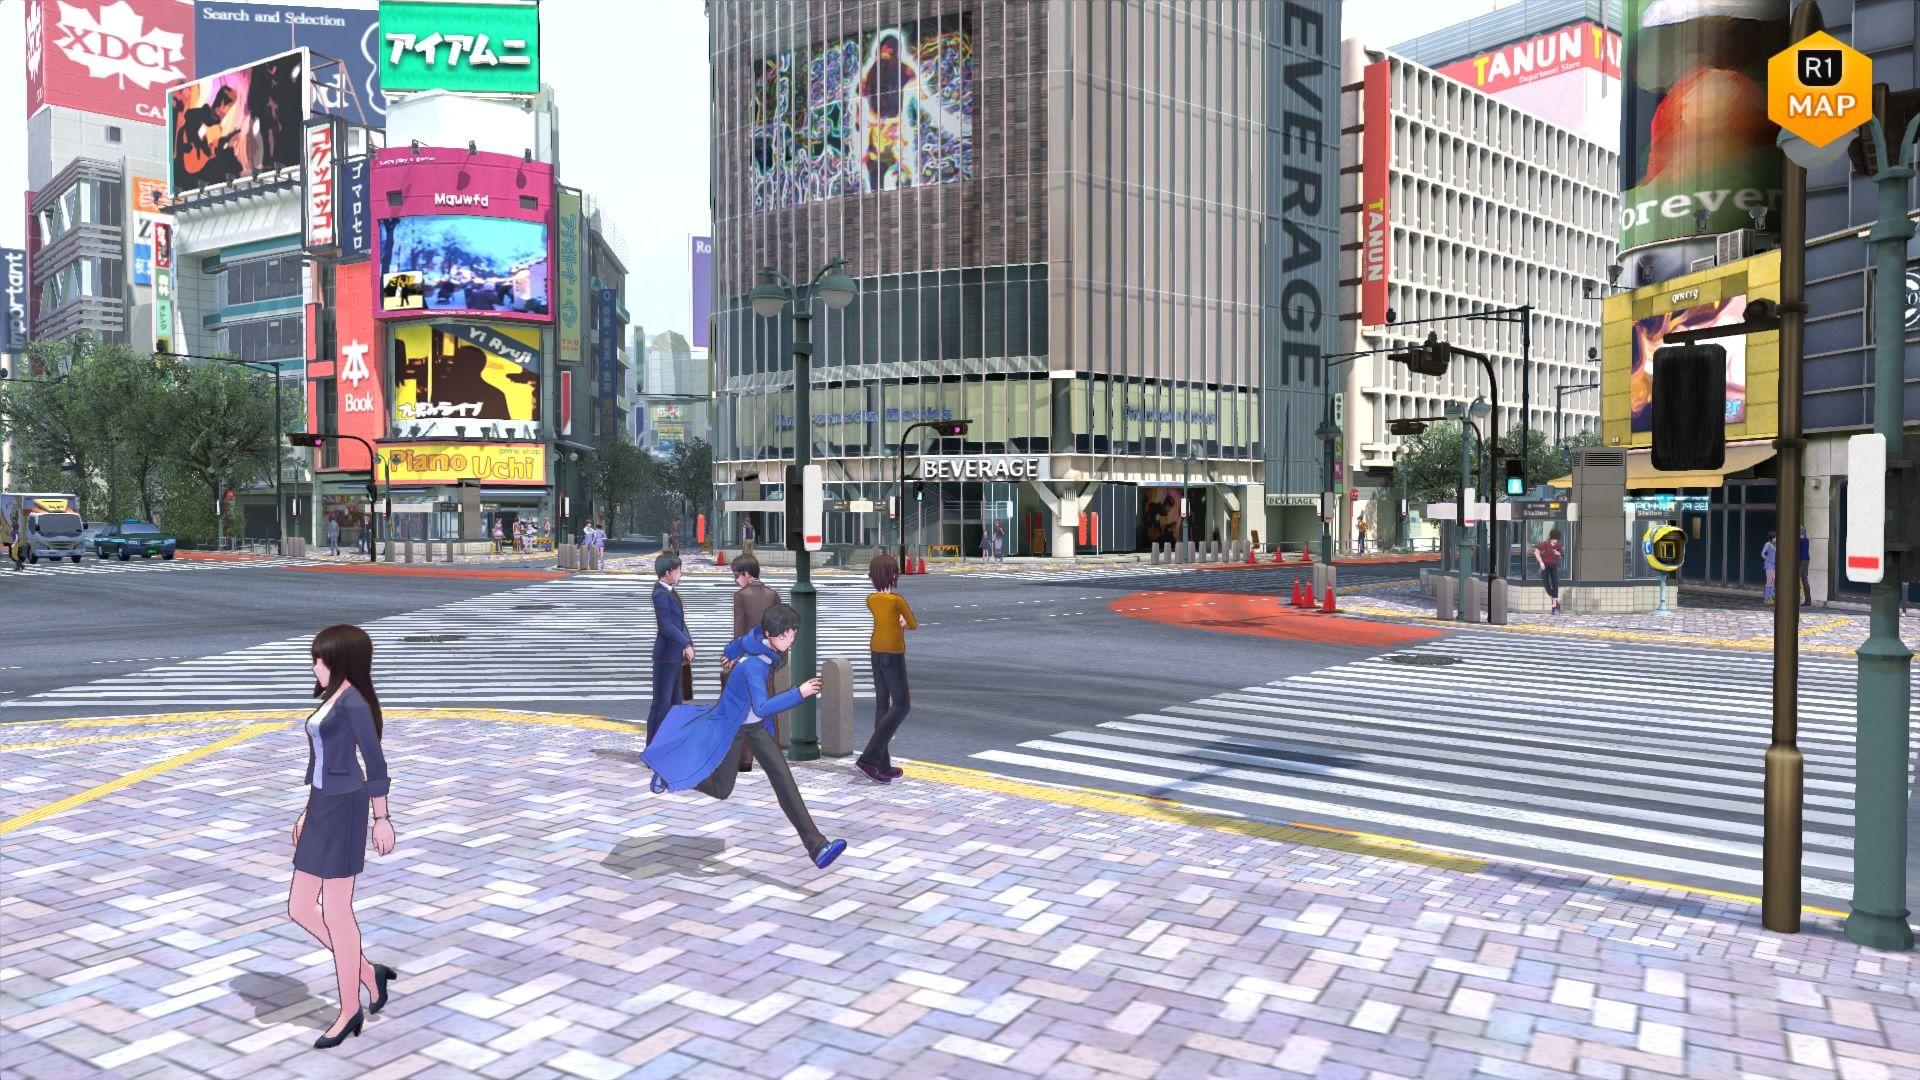 Map_Shibuya_1490009138